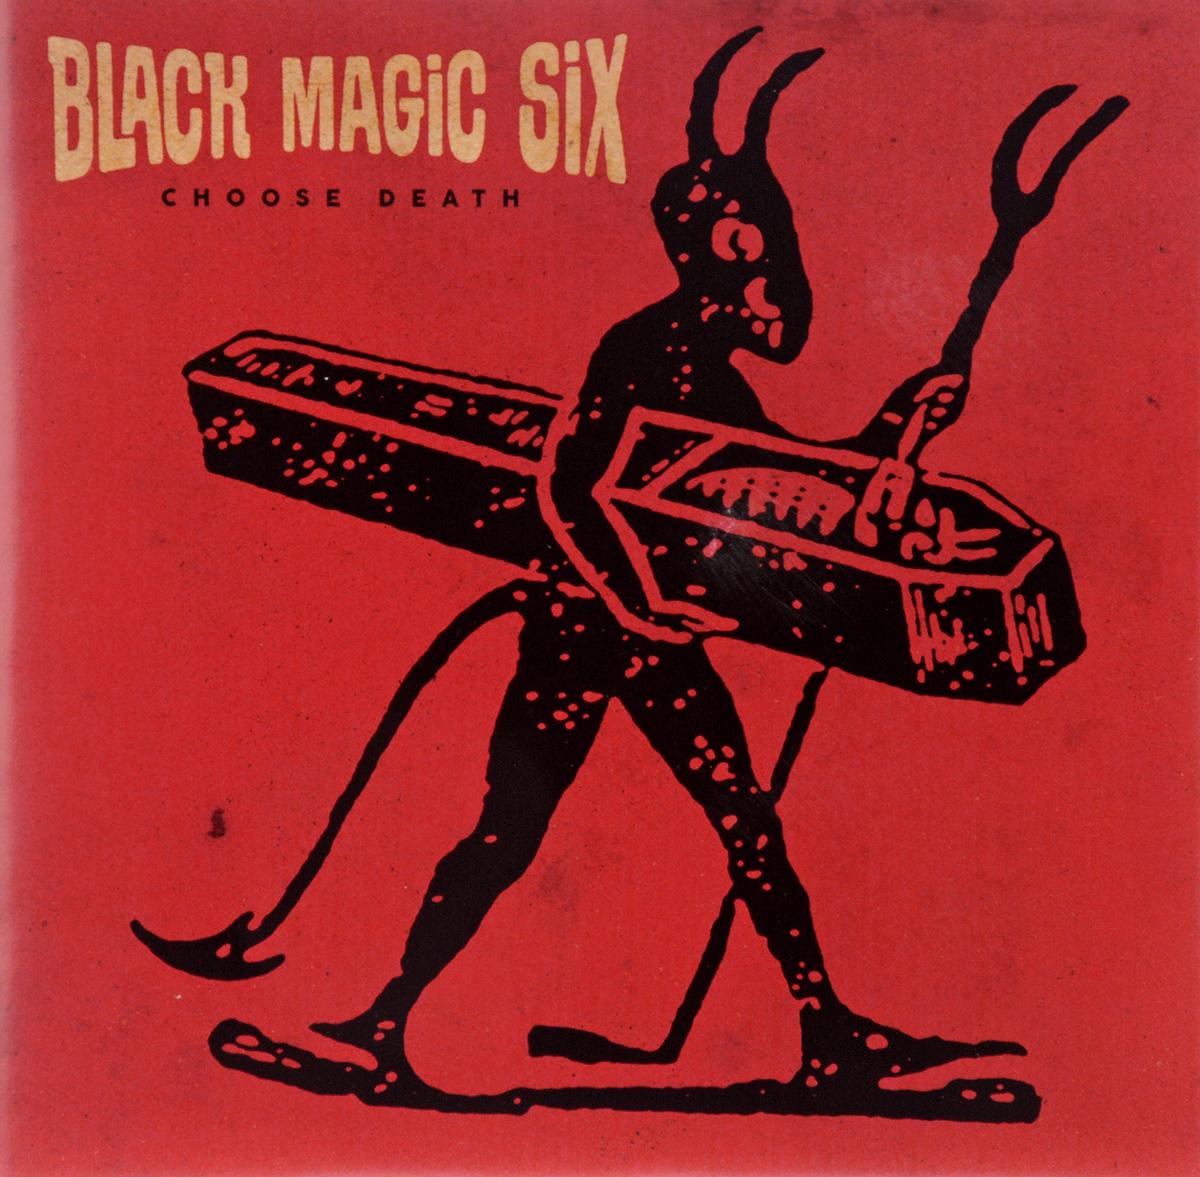 Black Magic Six Black Magic Six. Choose Death cherry adair black magic